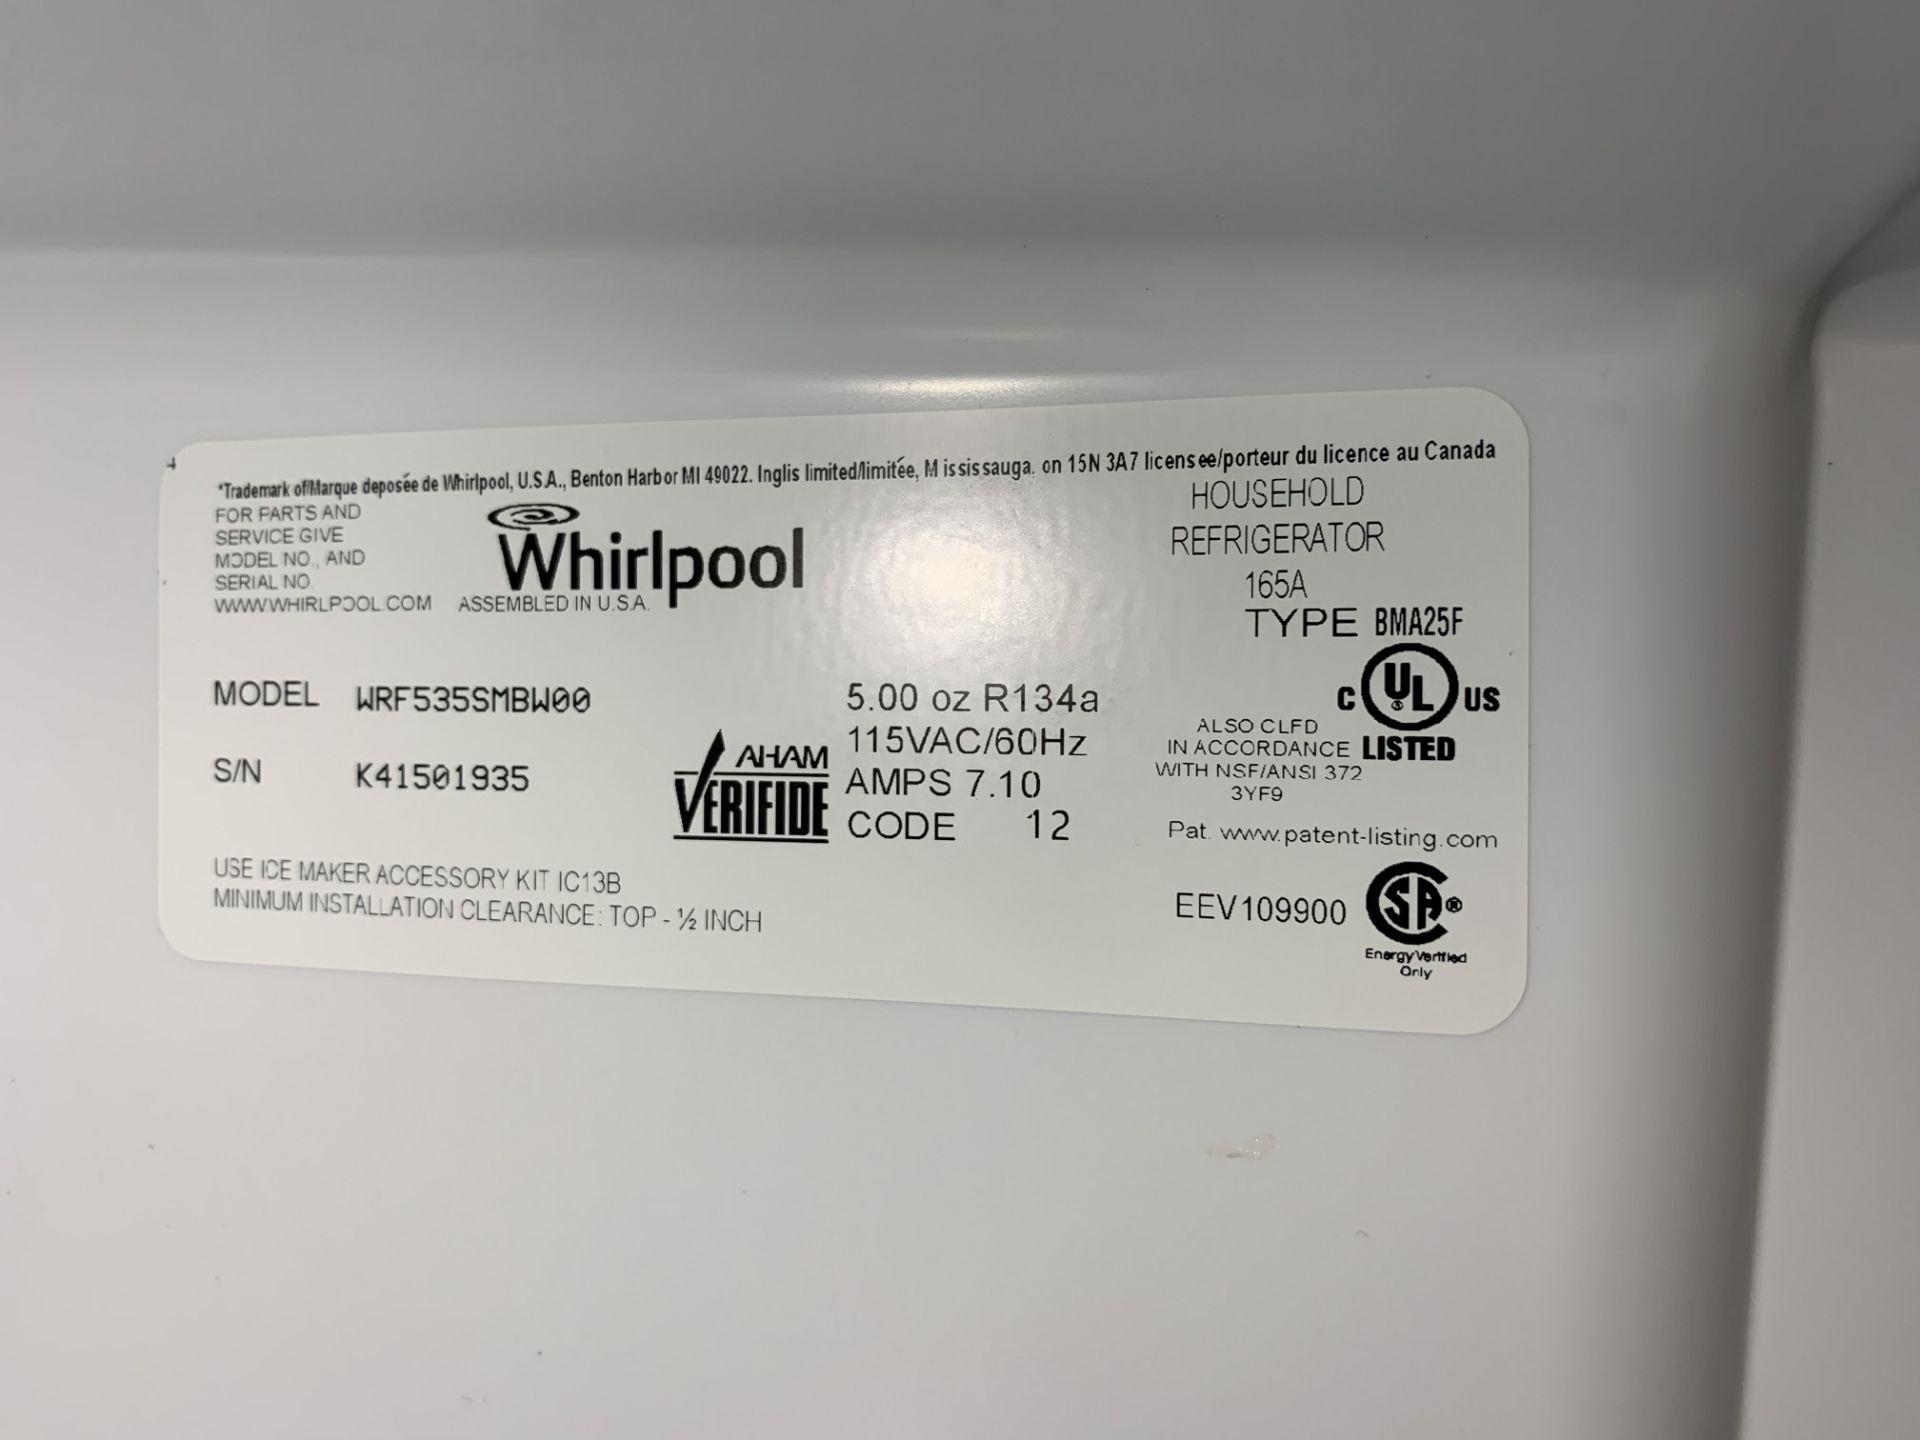 Lot 301 - WHIRLPOOL WRF535SMBWOO WHITE FRENCH DOOR REFRIGERATOR / FREEZER